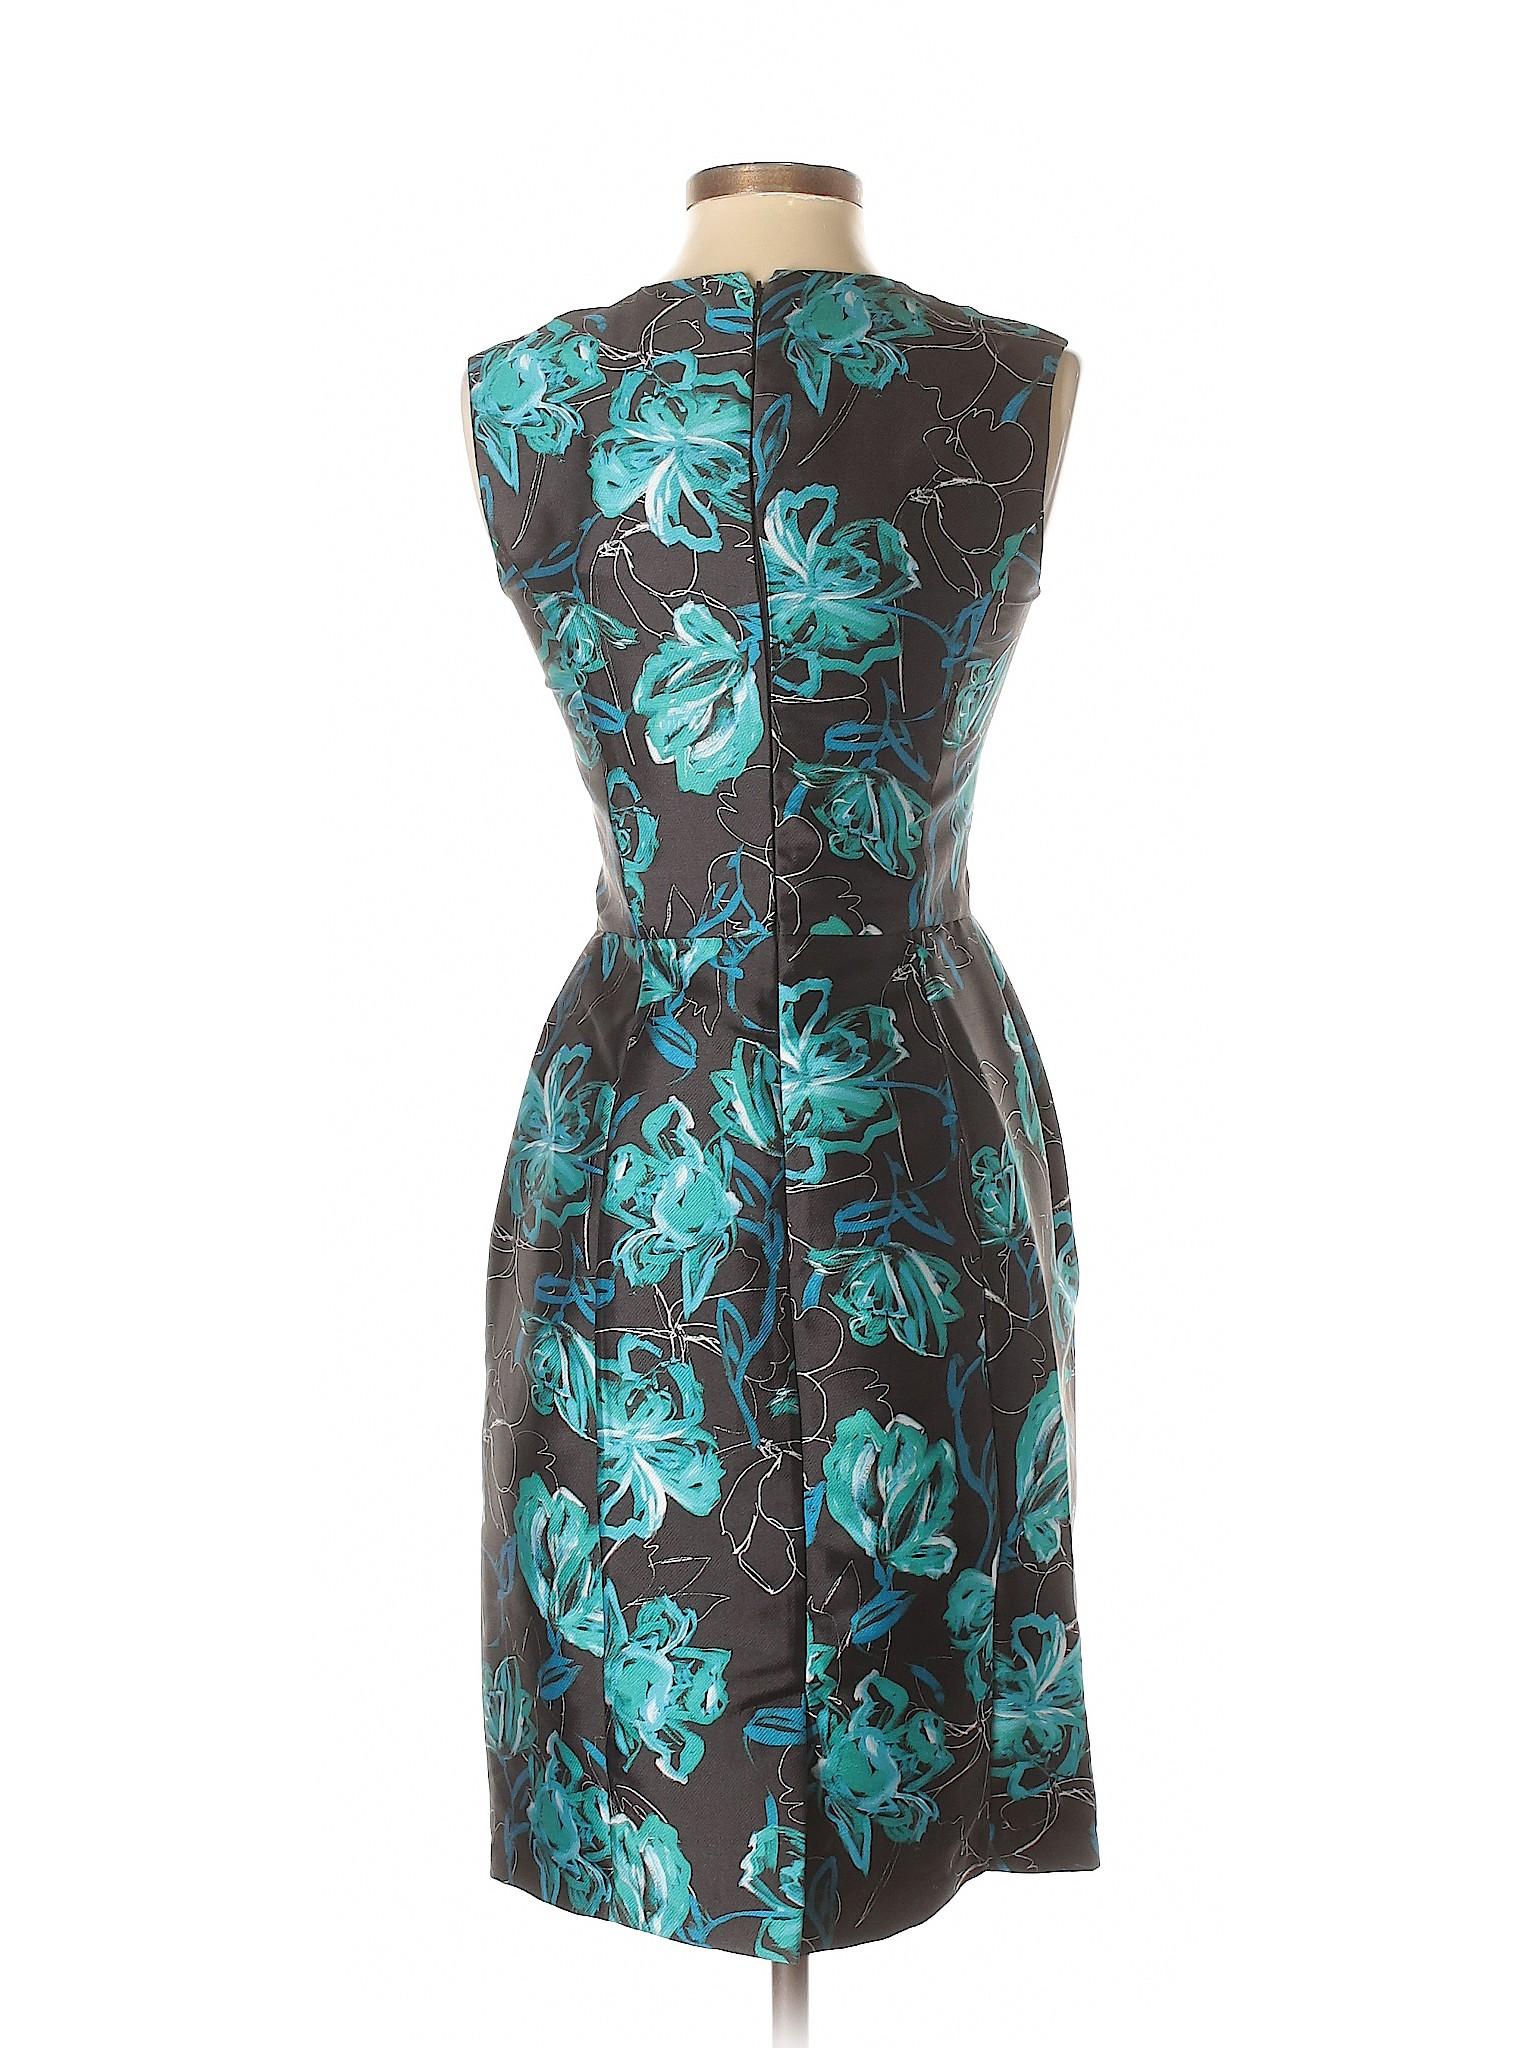 Dress winter Casual NOIR Boutique Babi Sachin HpqBw6S